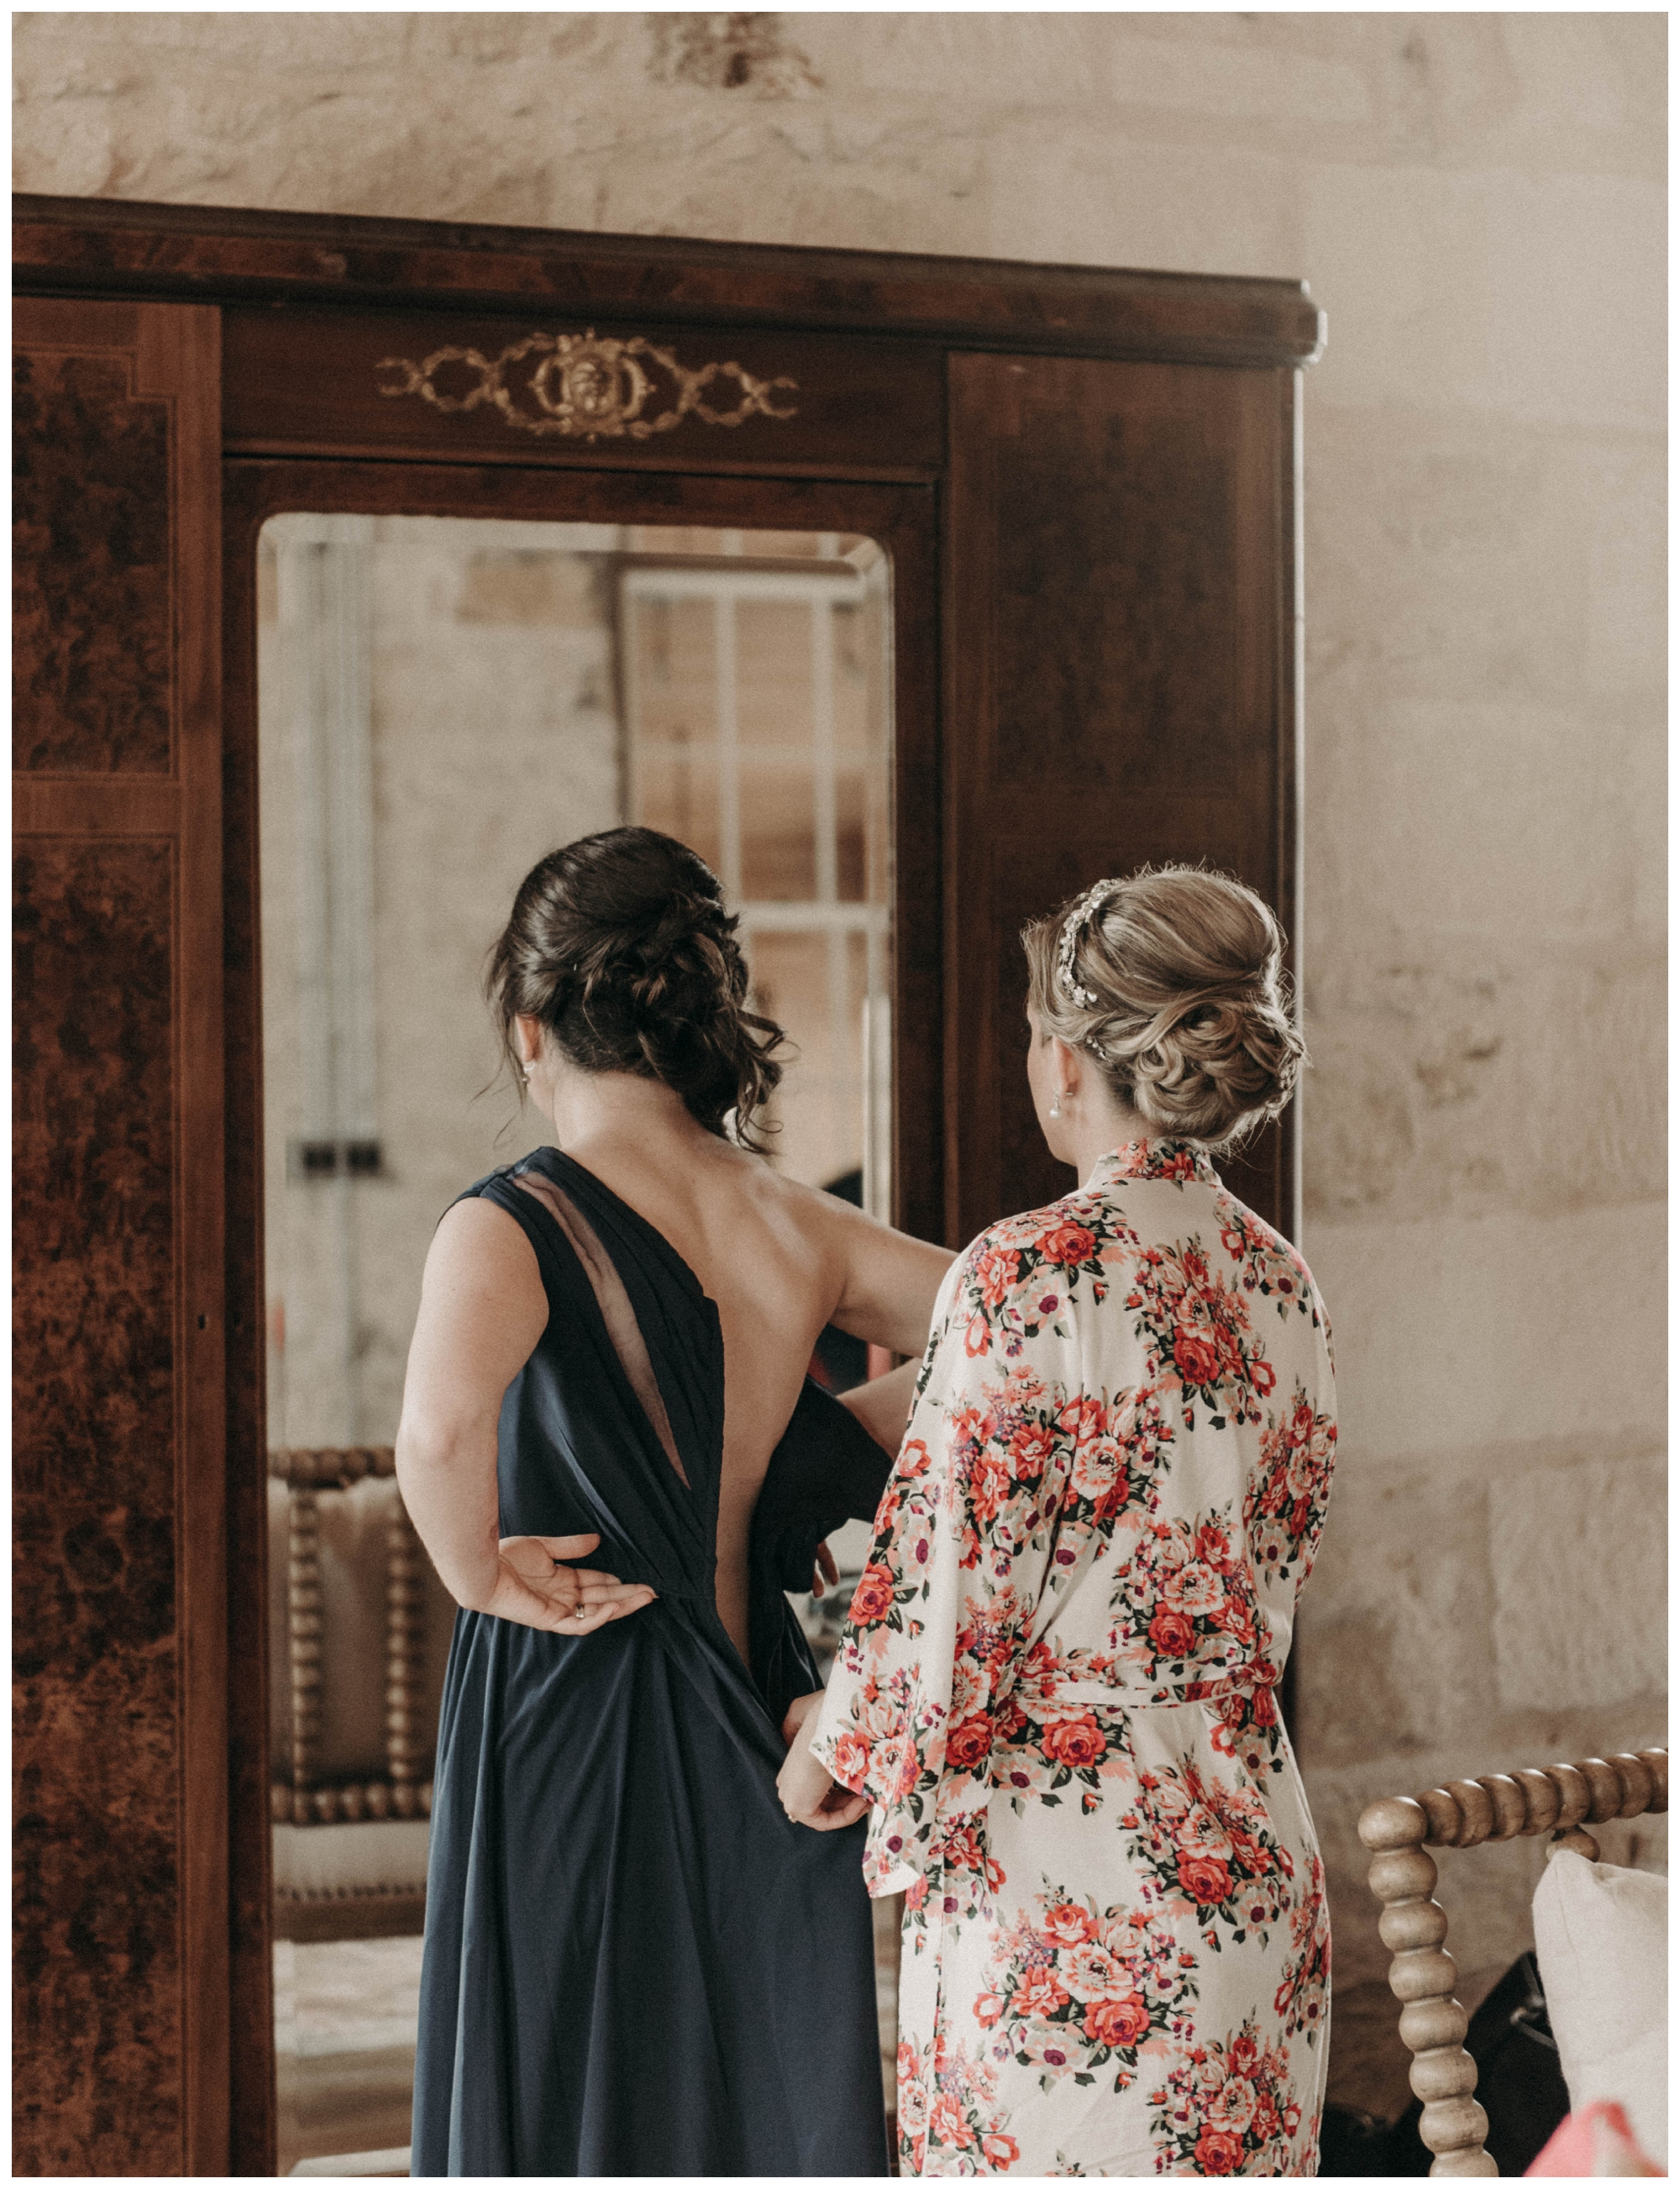 austin-texas-wedding-photography-1778-photographie_0013.jpg